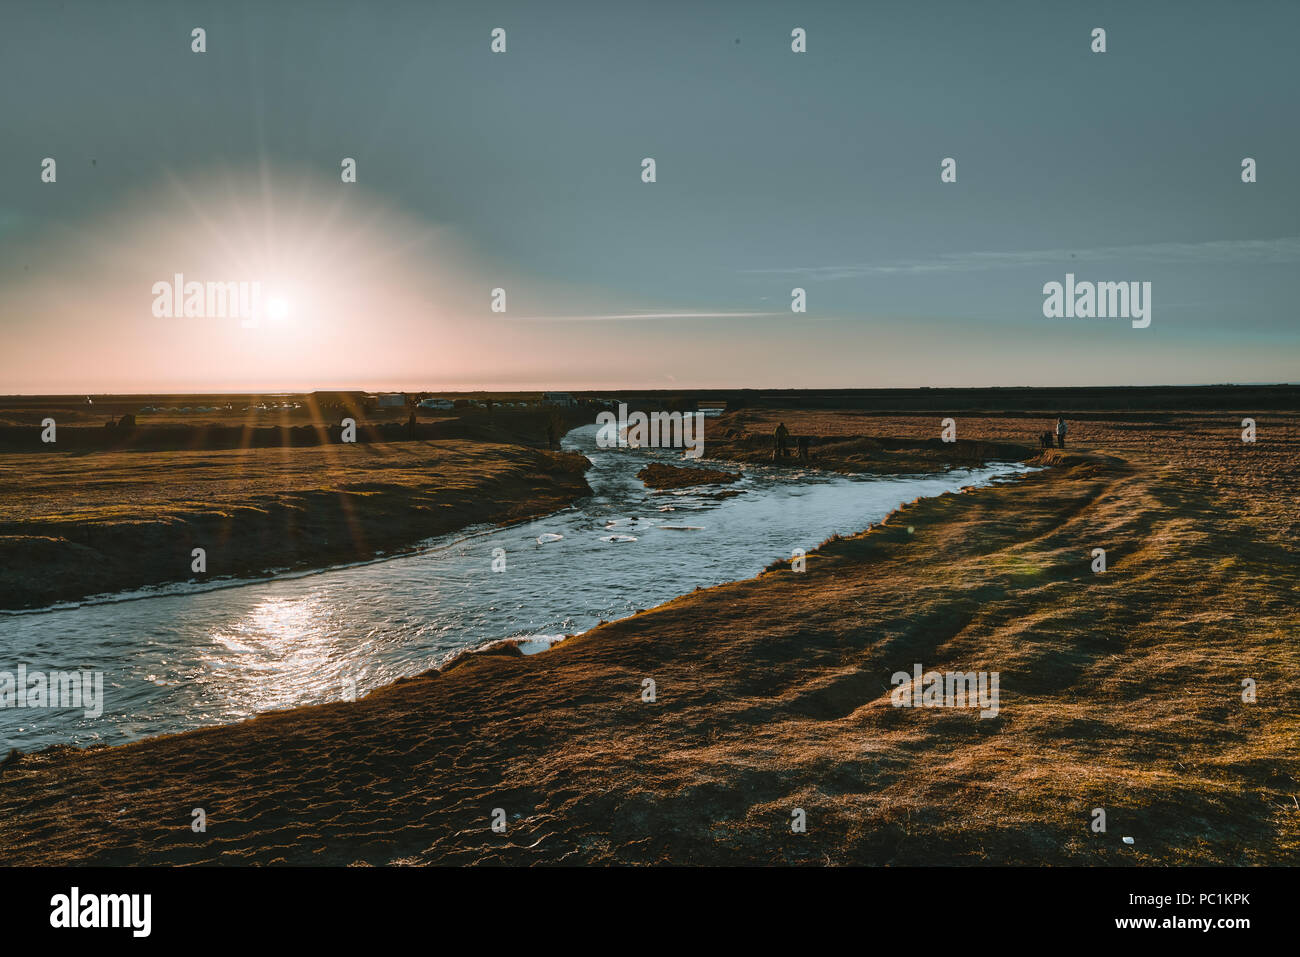 Island malerischen Sonnenuntergang am Wasserfall Seljalandsfoss südlich von Island. Stockbild